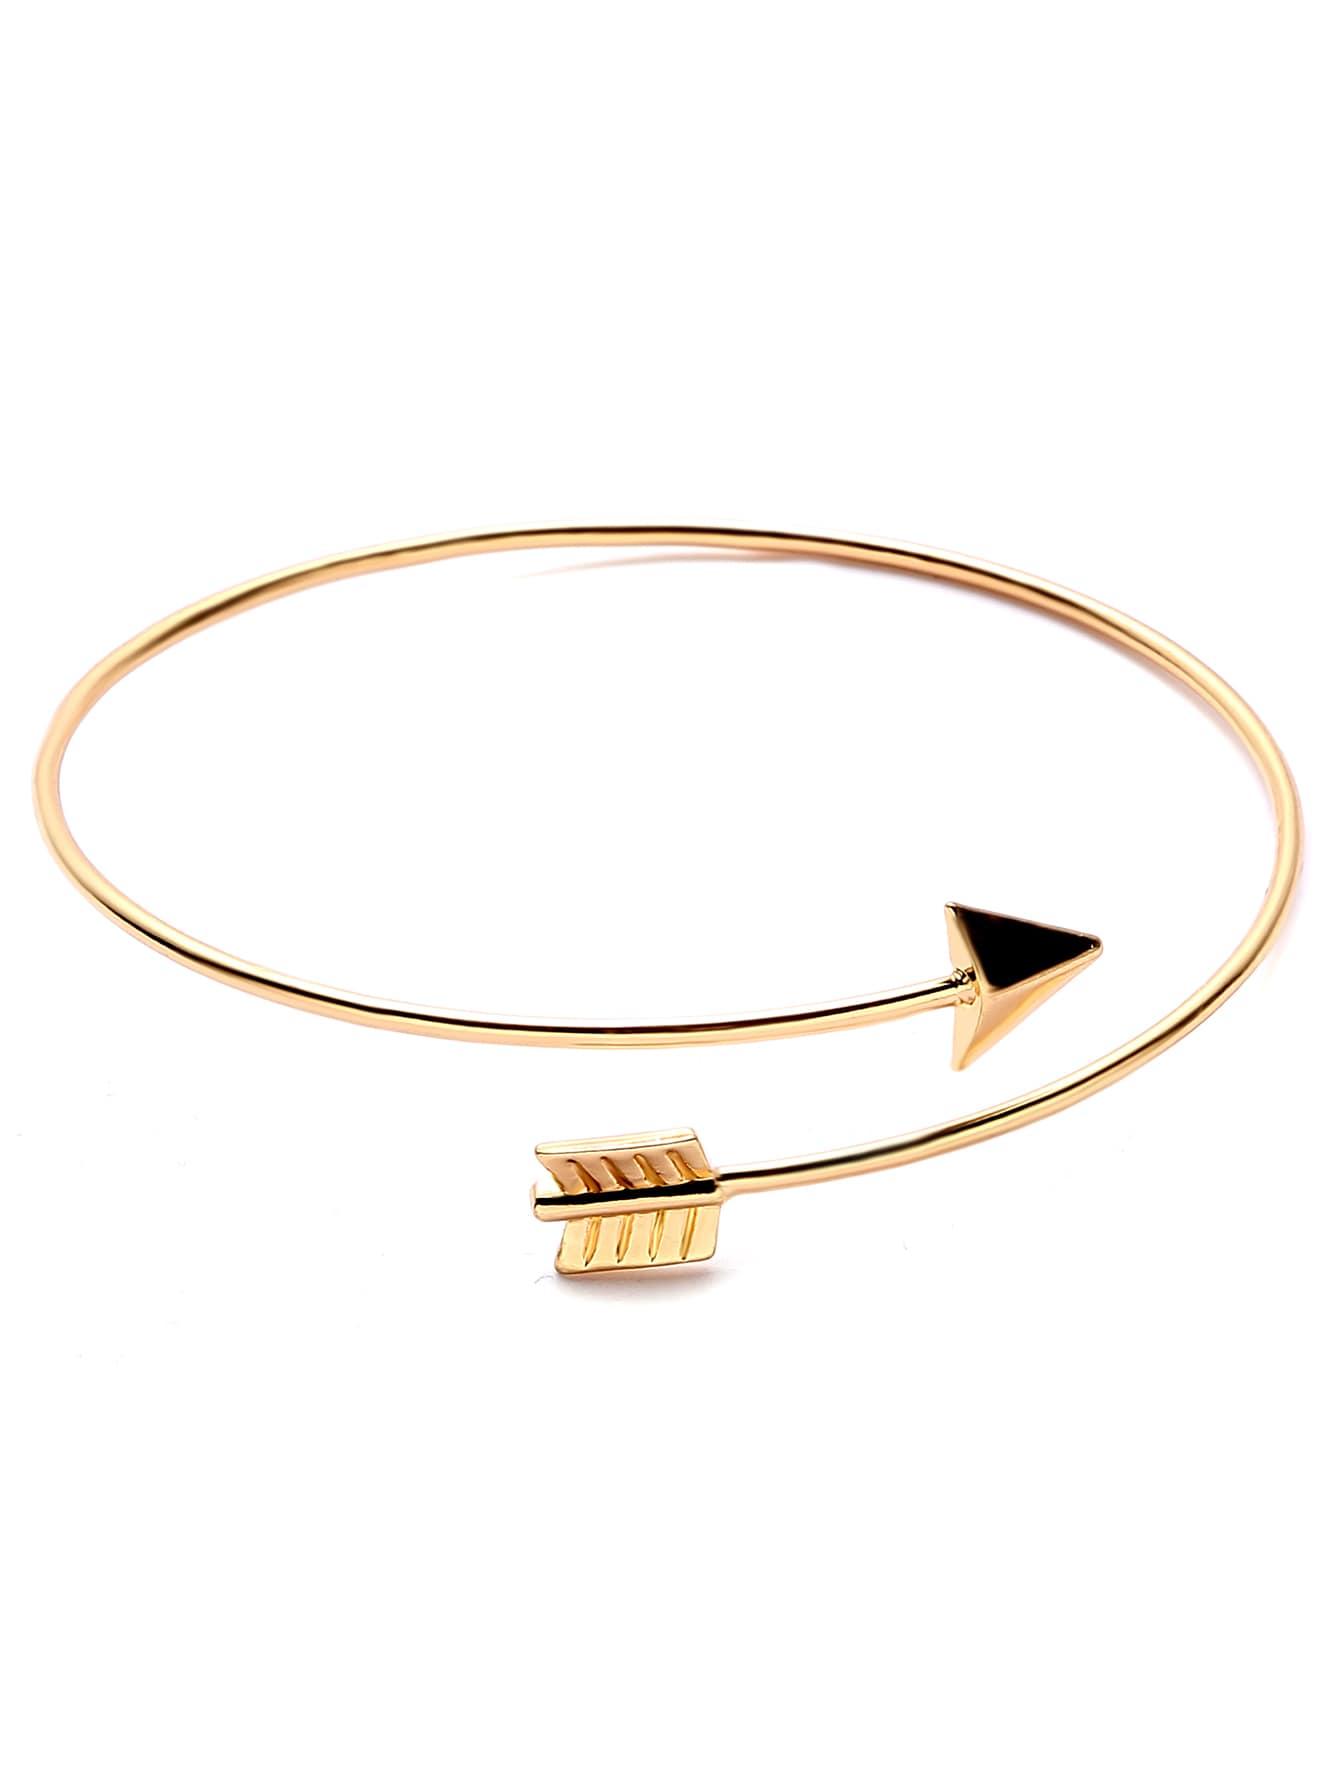 Gold Plated Arrow Wrap Bangle